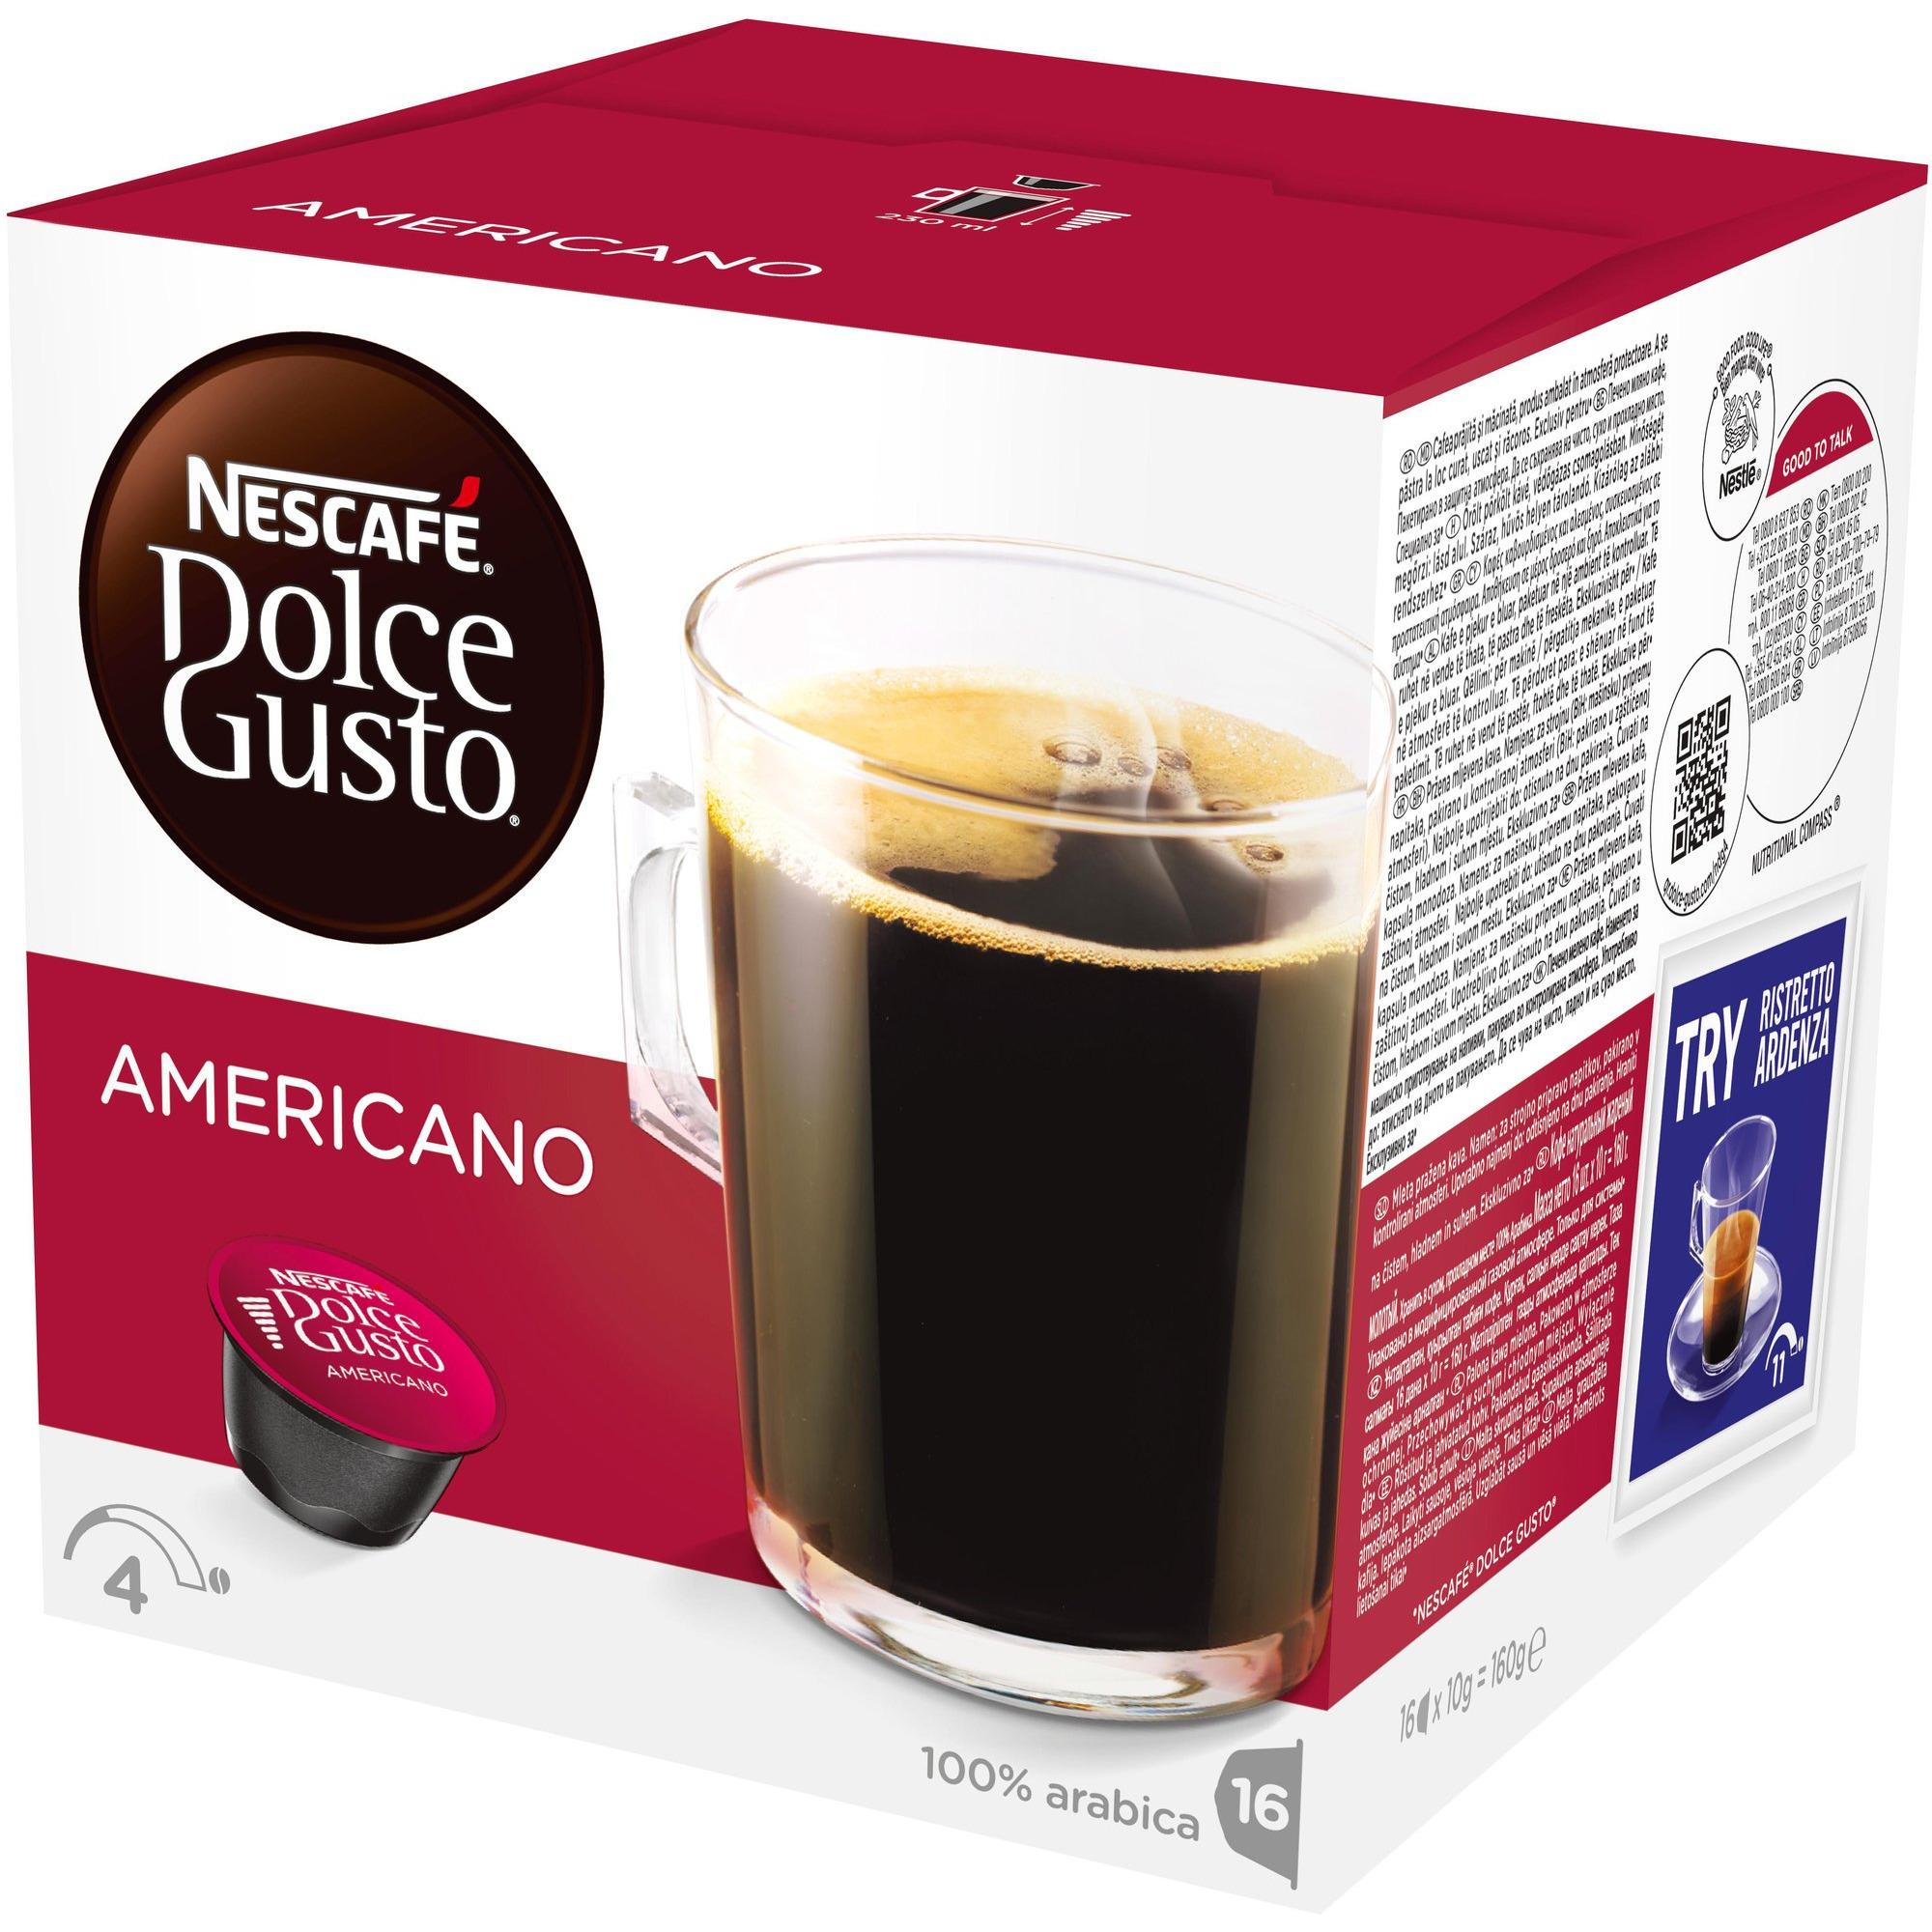 Nescafé Dolce Gusto Americano Kaffekapslar